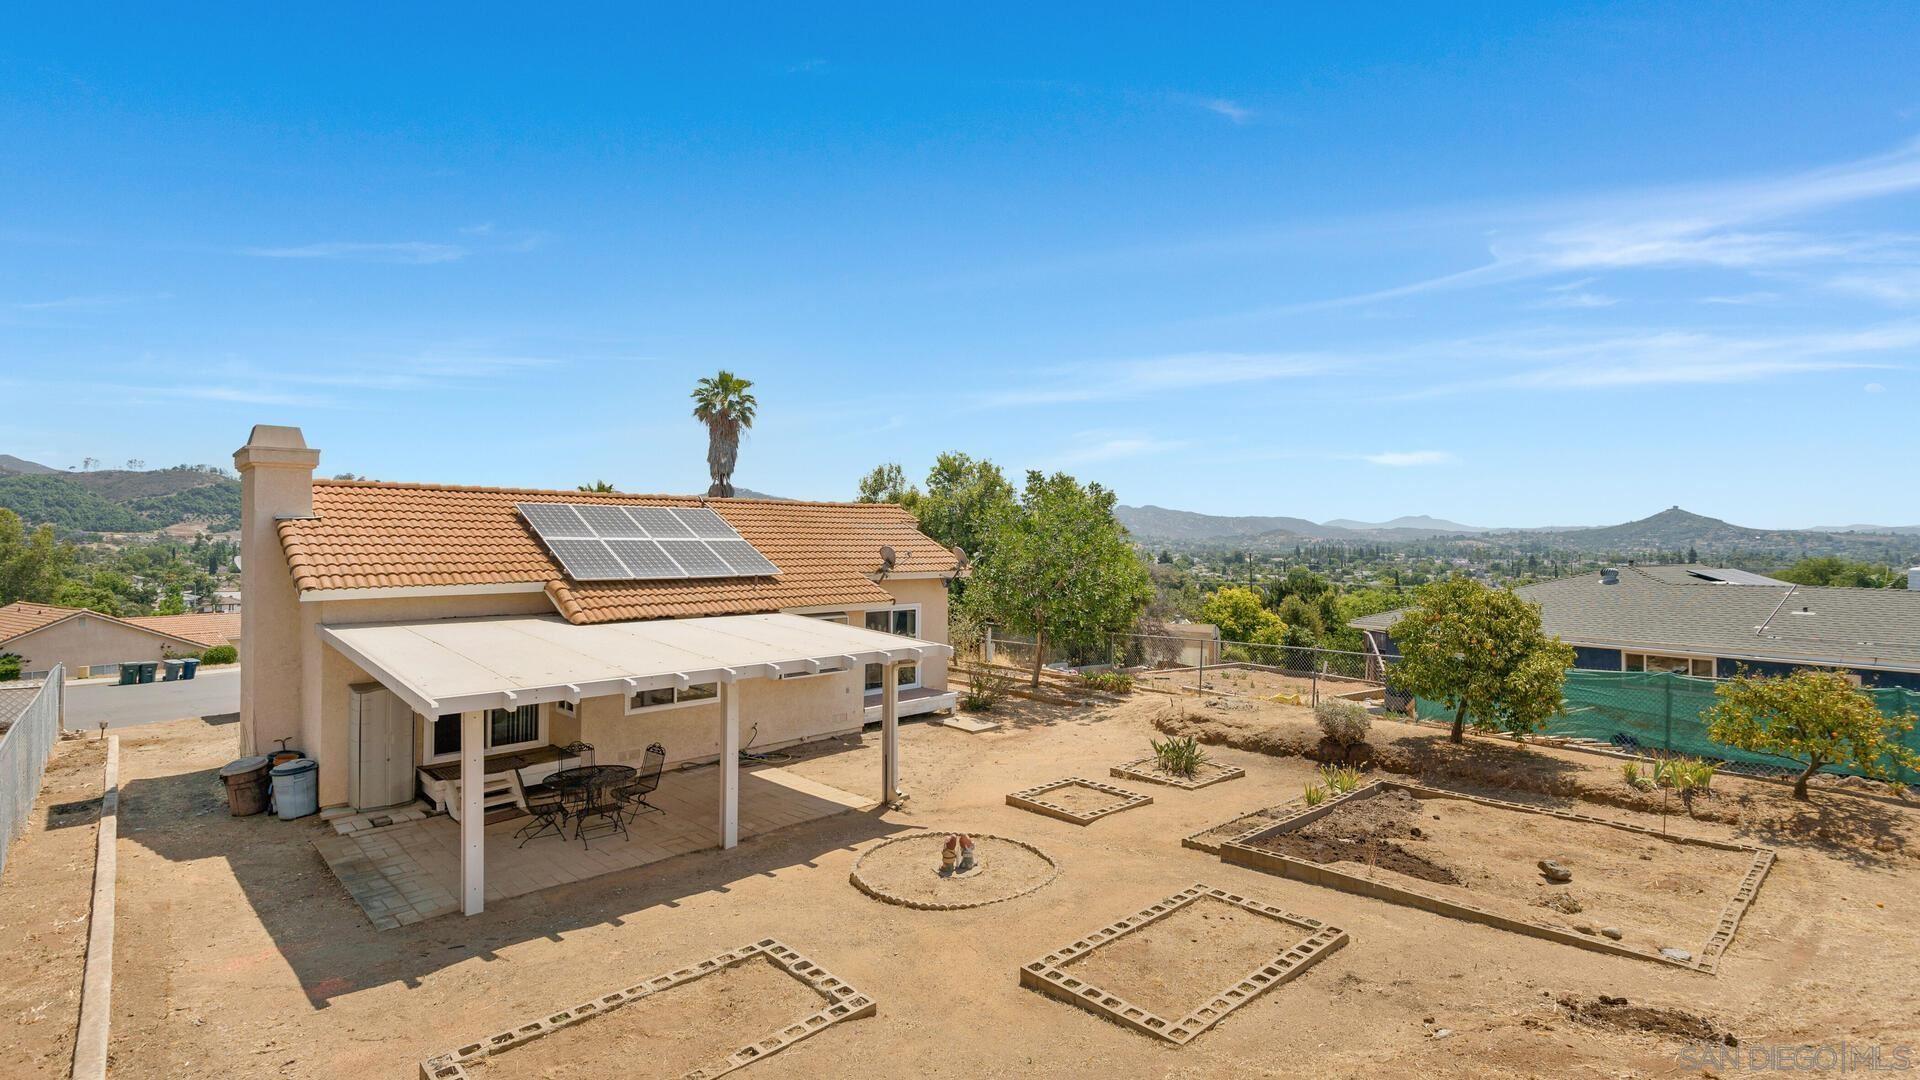 Photo of 1101 Cleo Ct, Escondido, CA 92027 (MLS # 210016360)